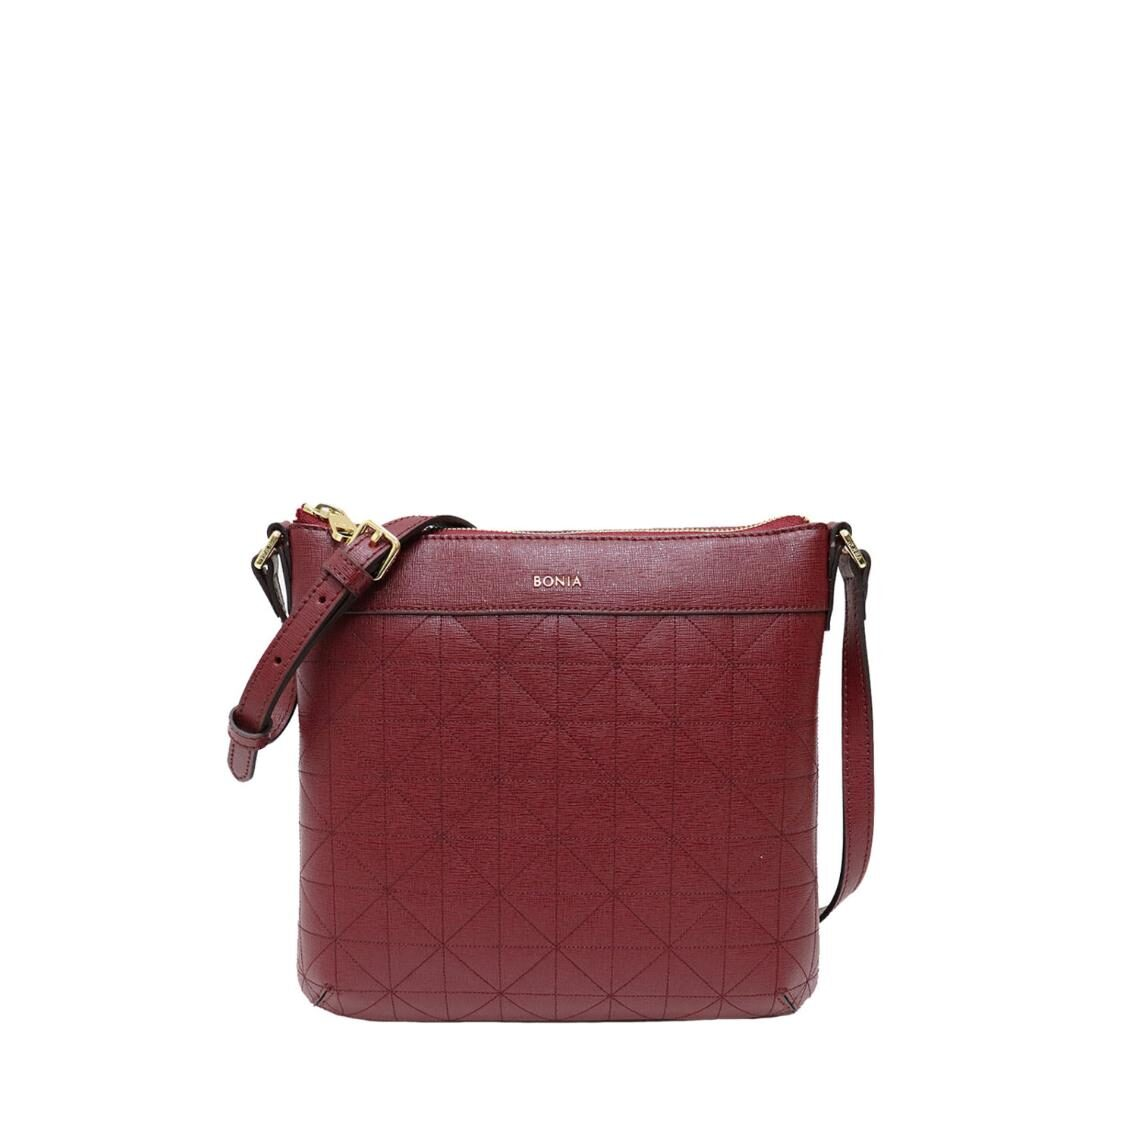 Bonia Crossbody Bag 801417-003